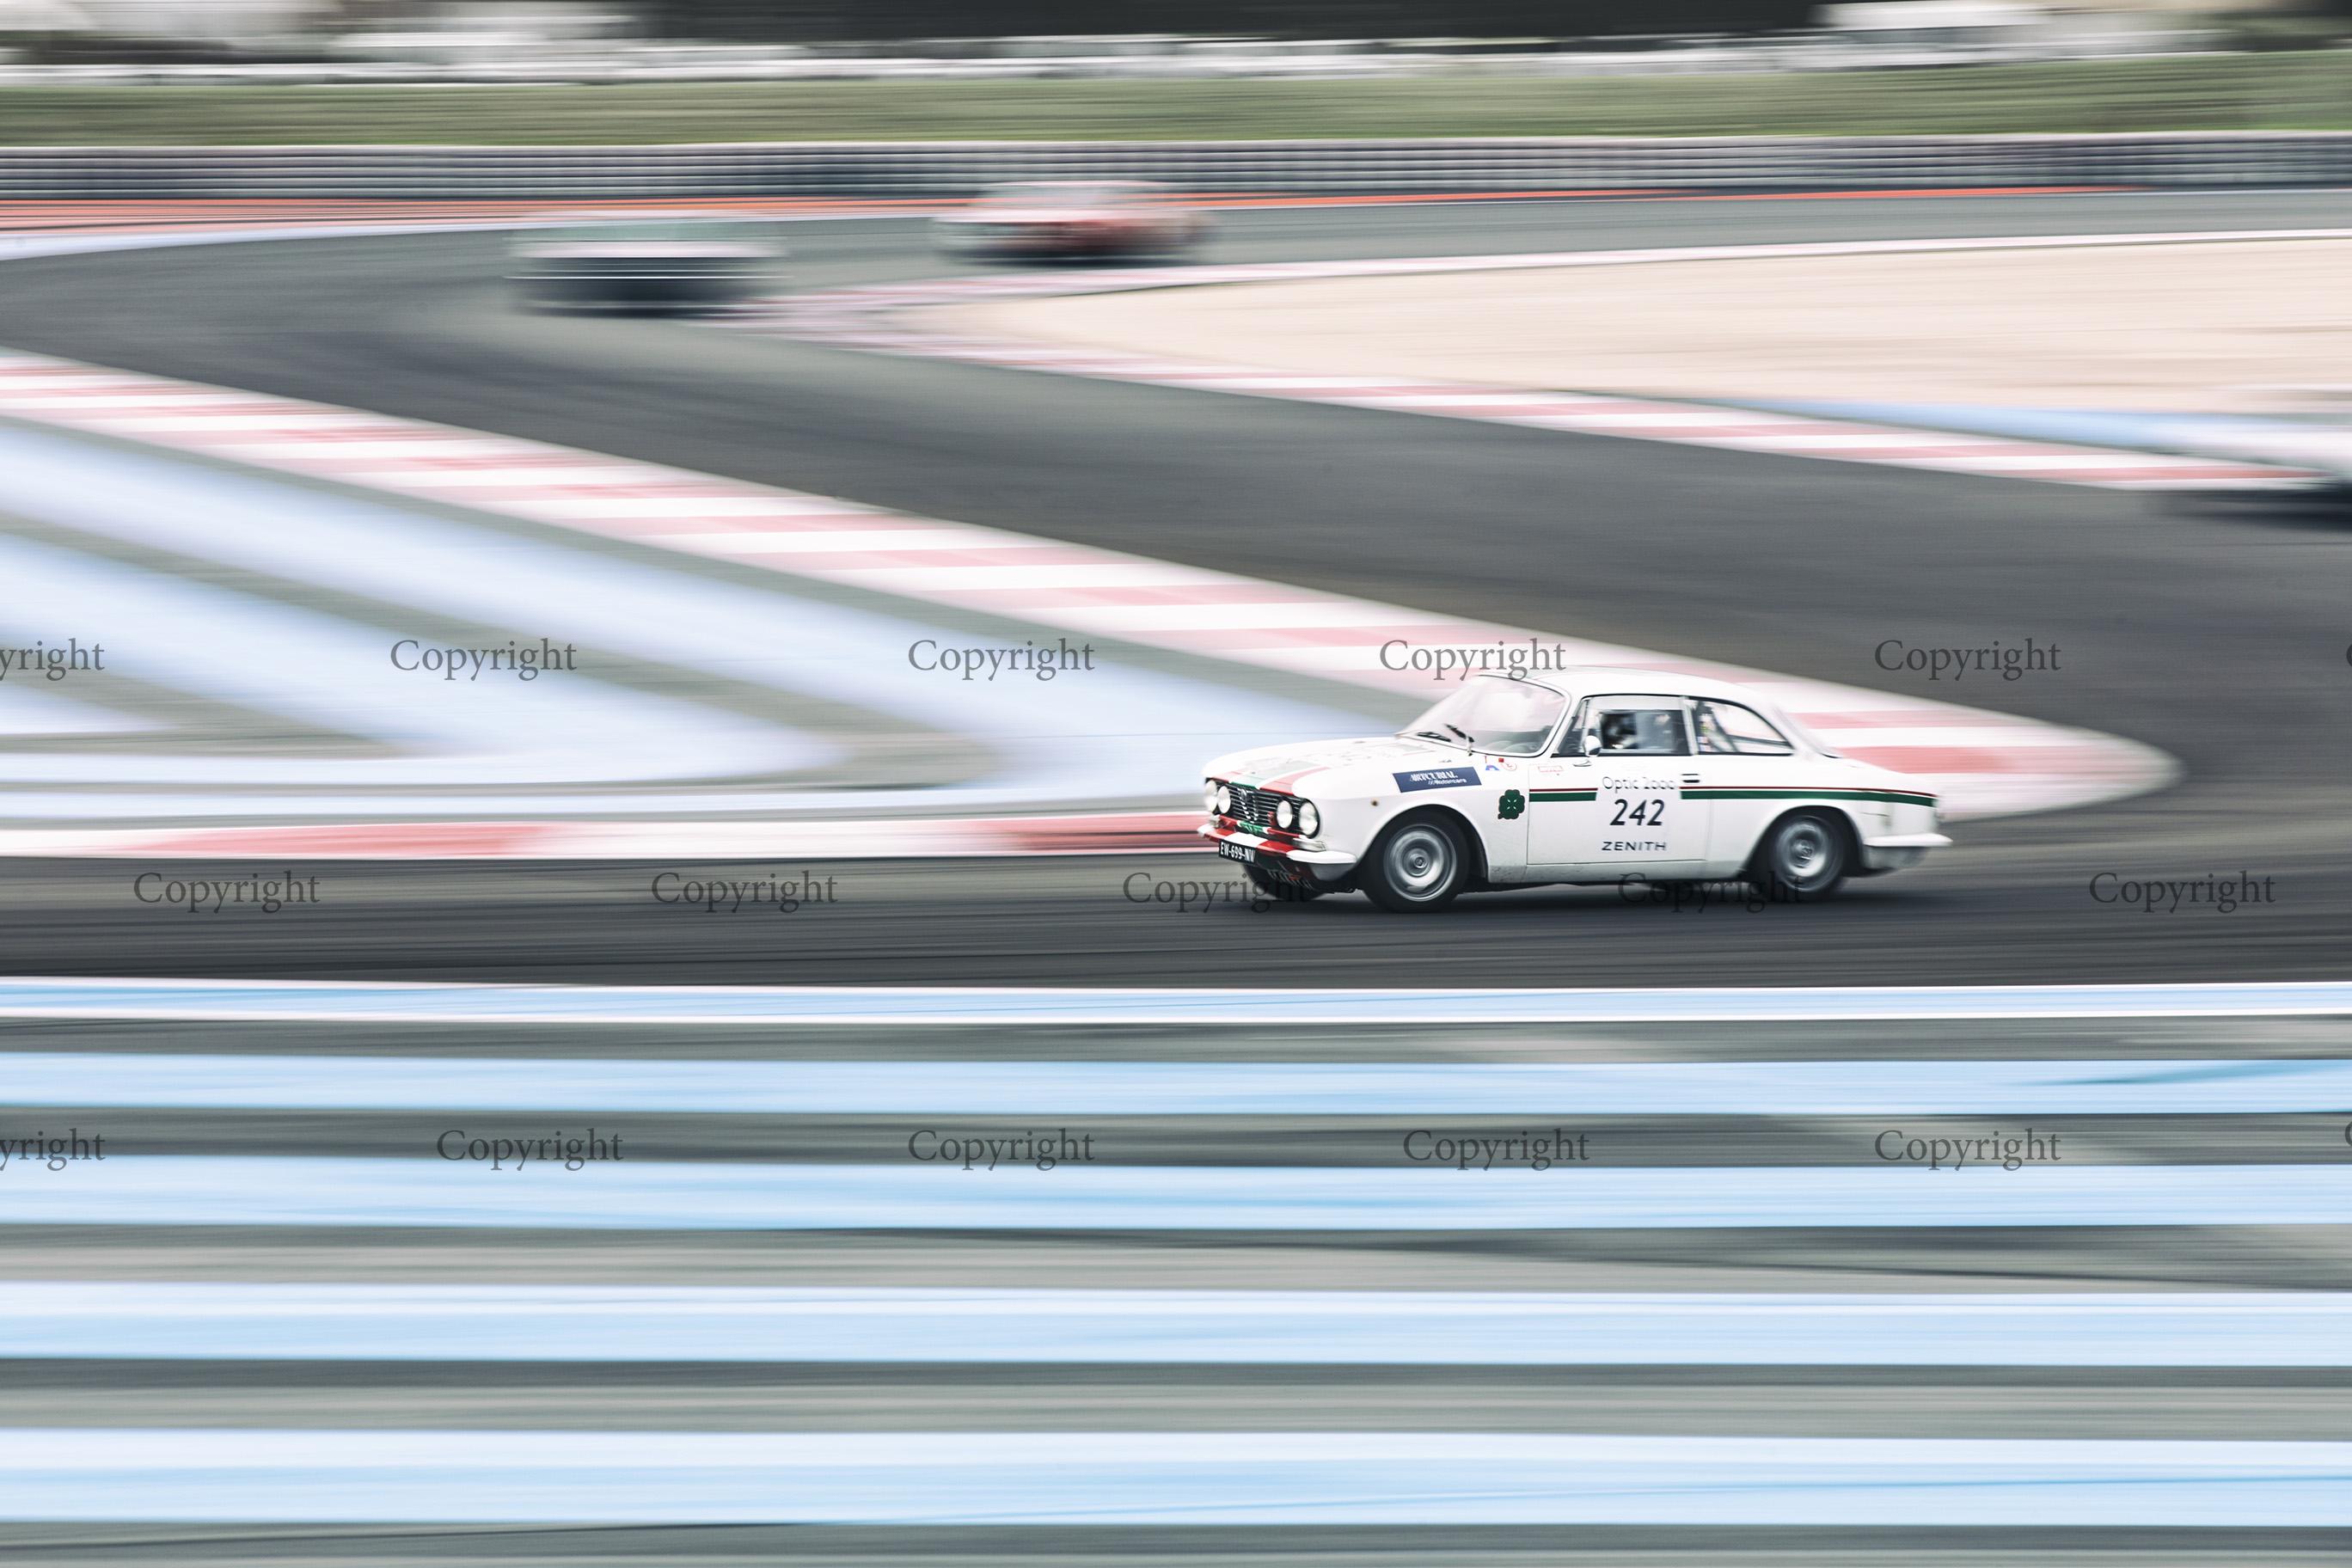 2000 GTV 1972